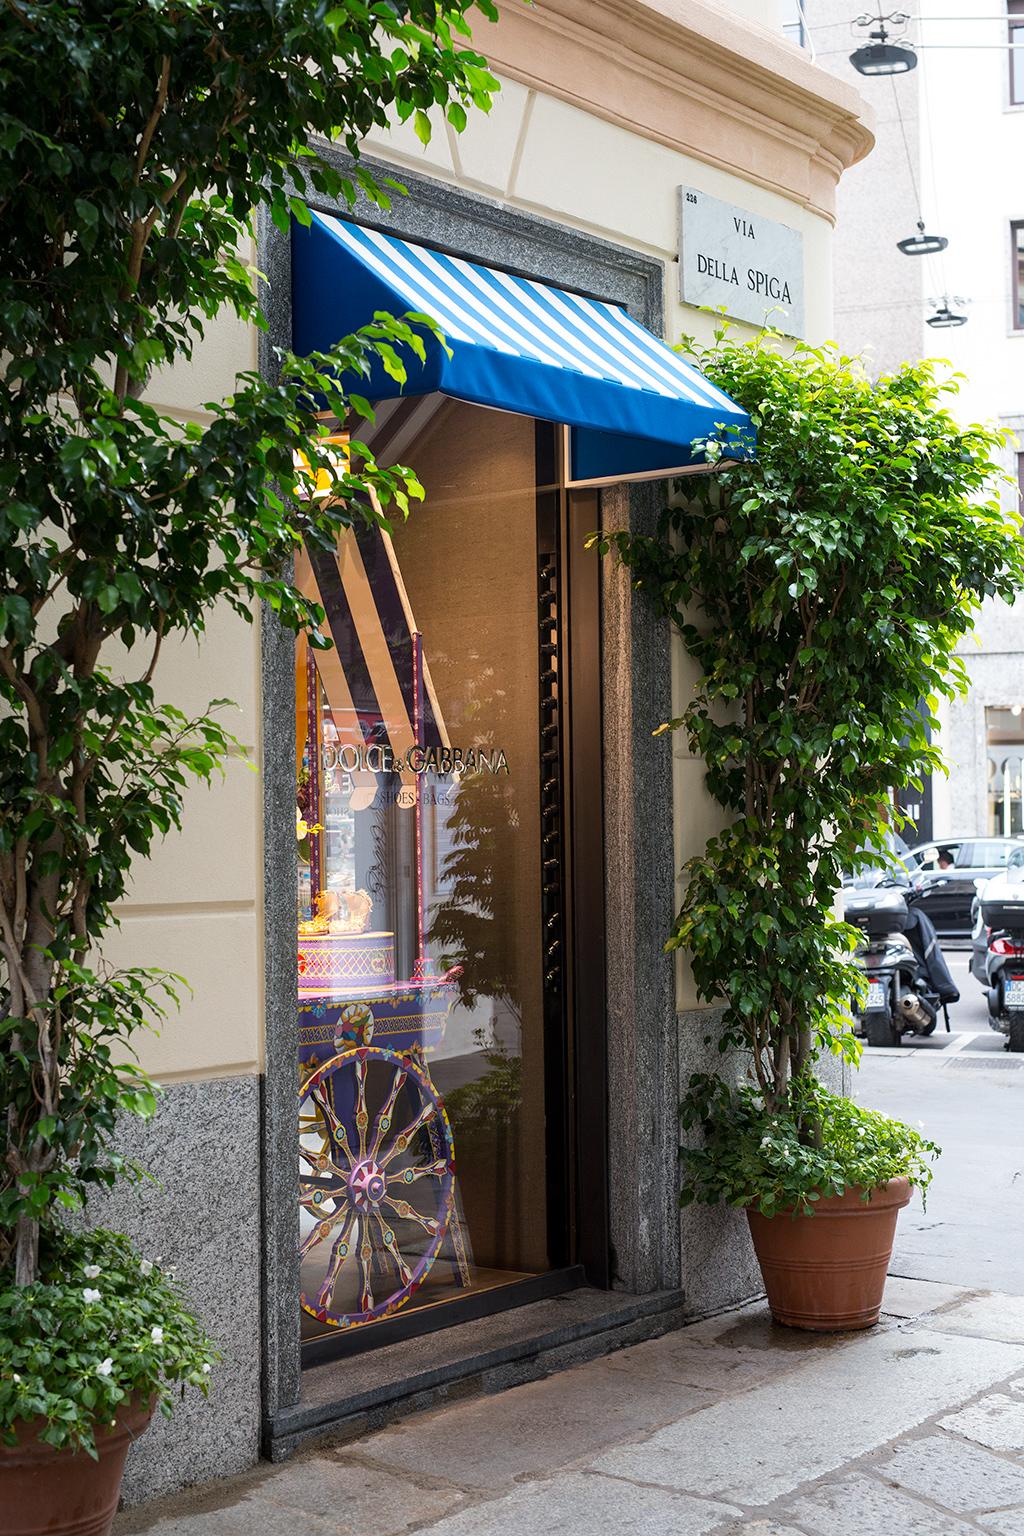 Stylesnooperdan-Milan-Travel-Guide-13.jpg